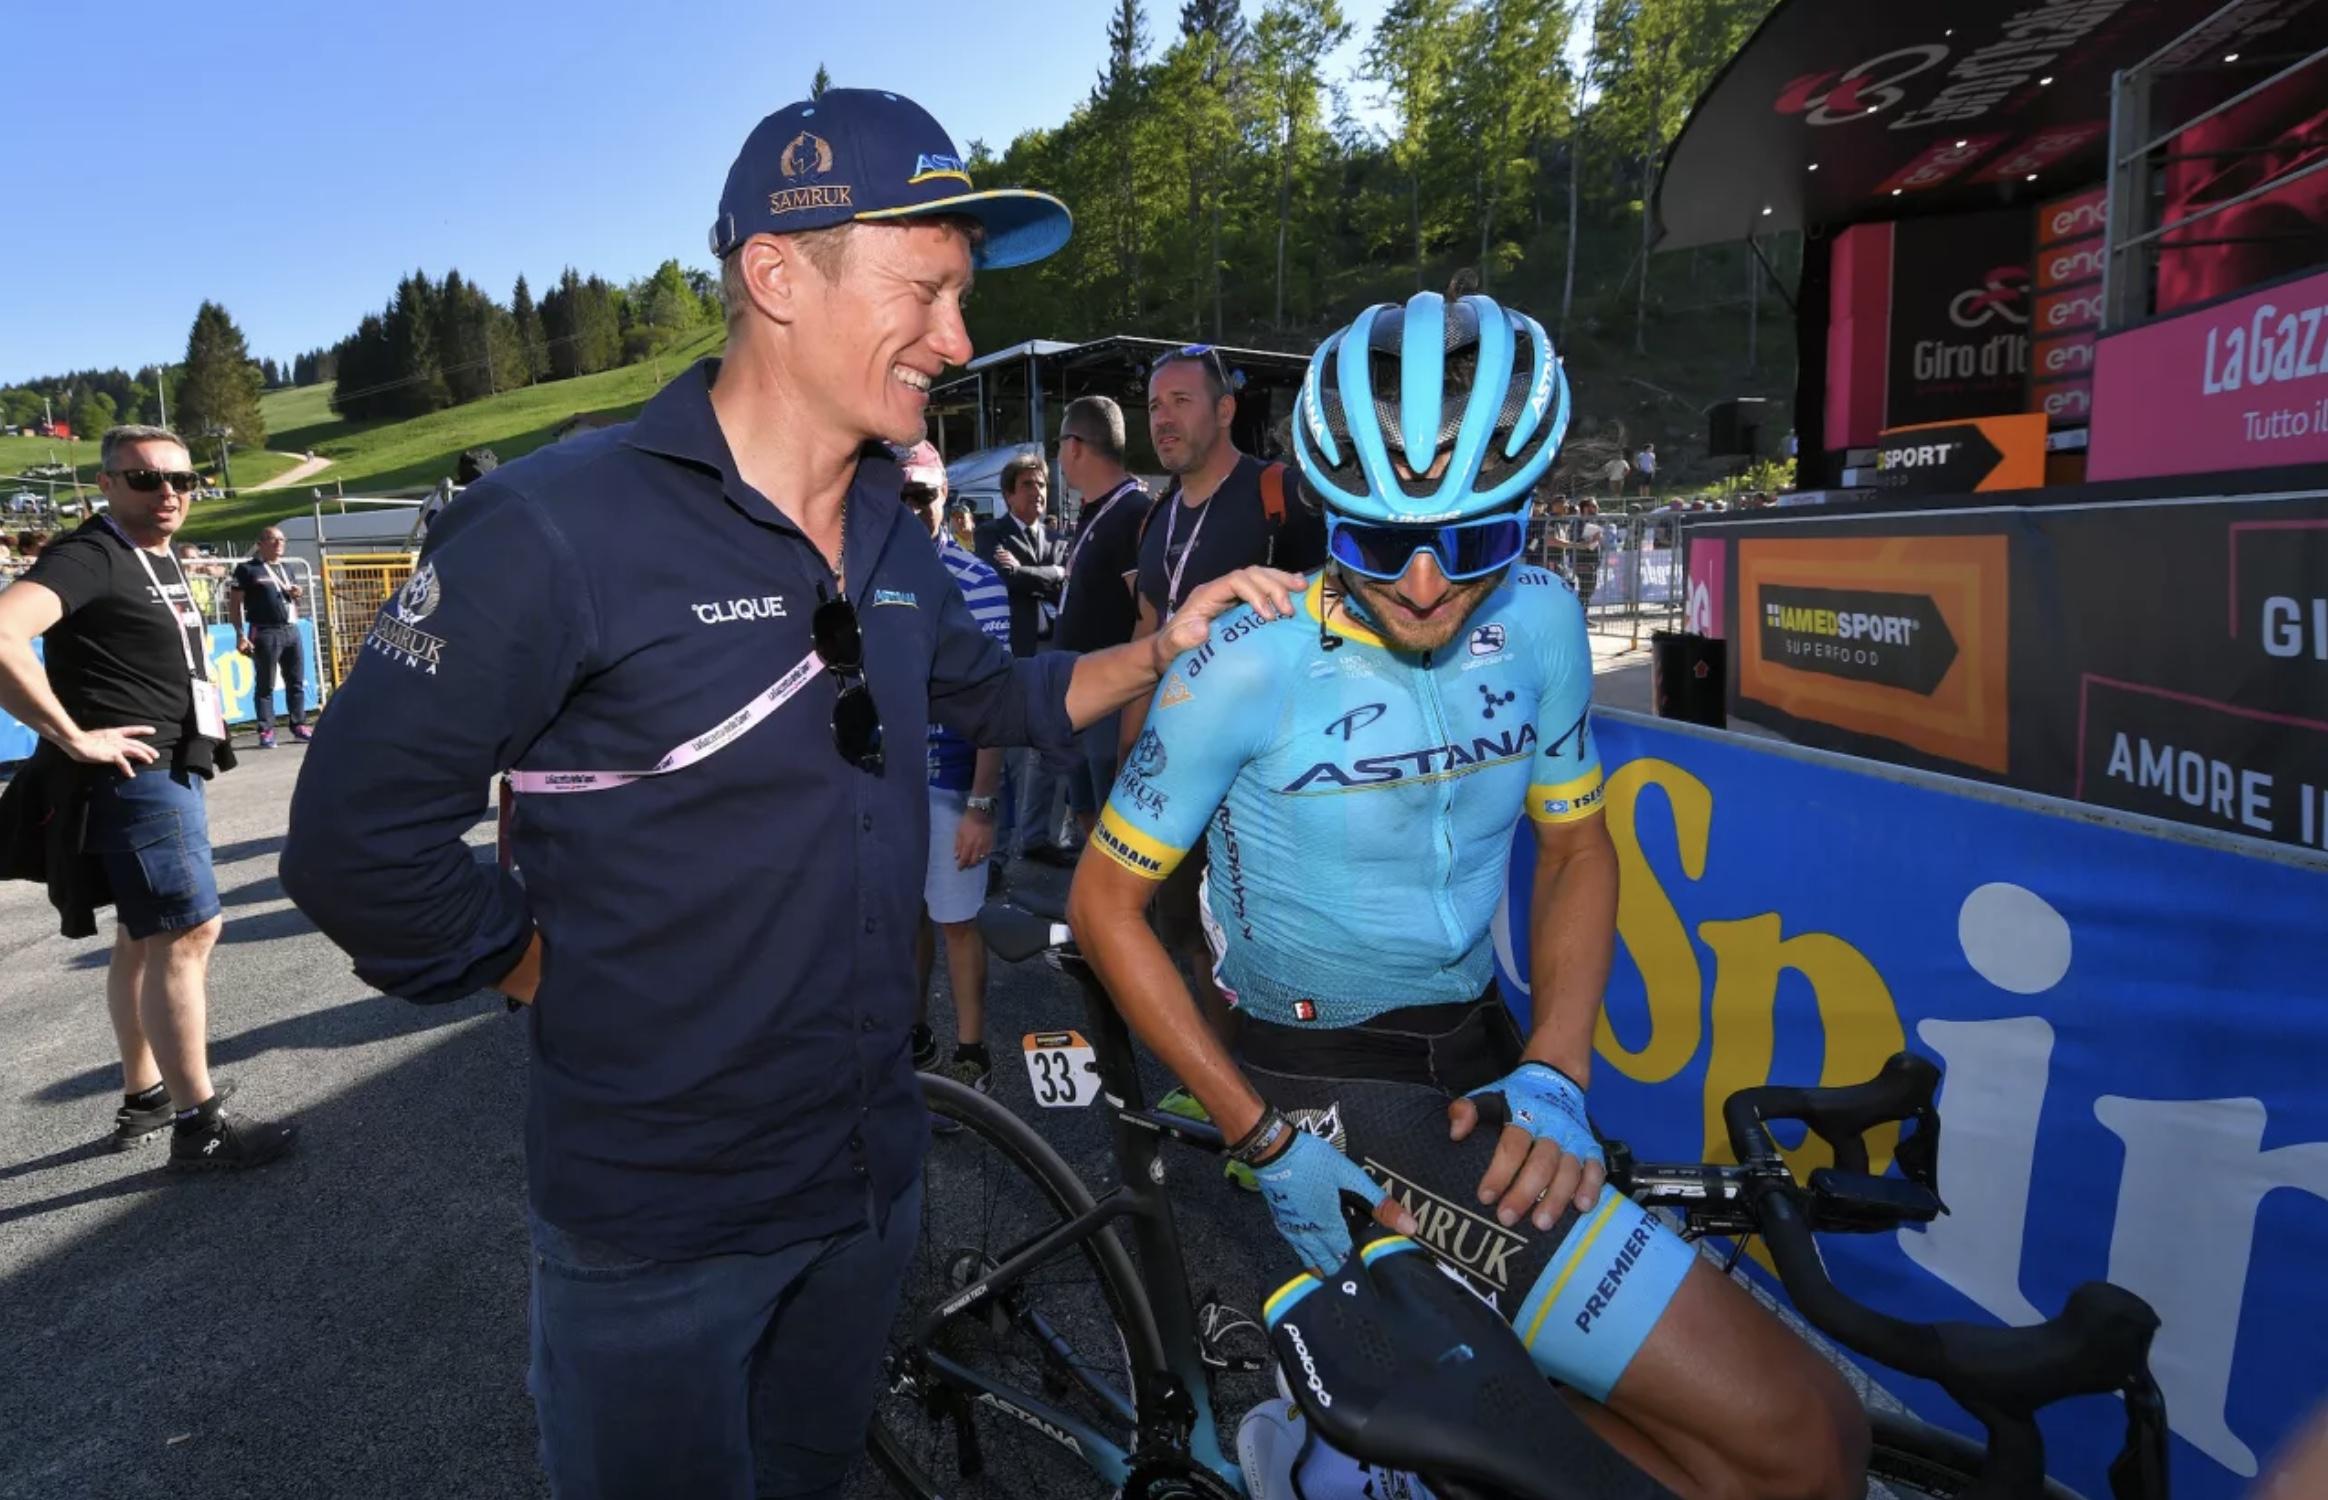 Alexandre Vinokourov torna a capo della Astana